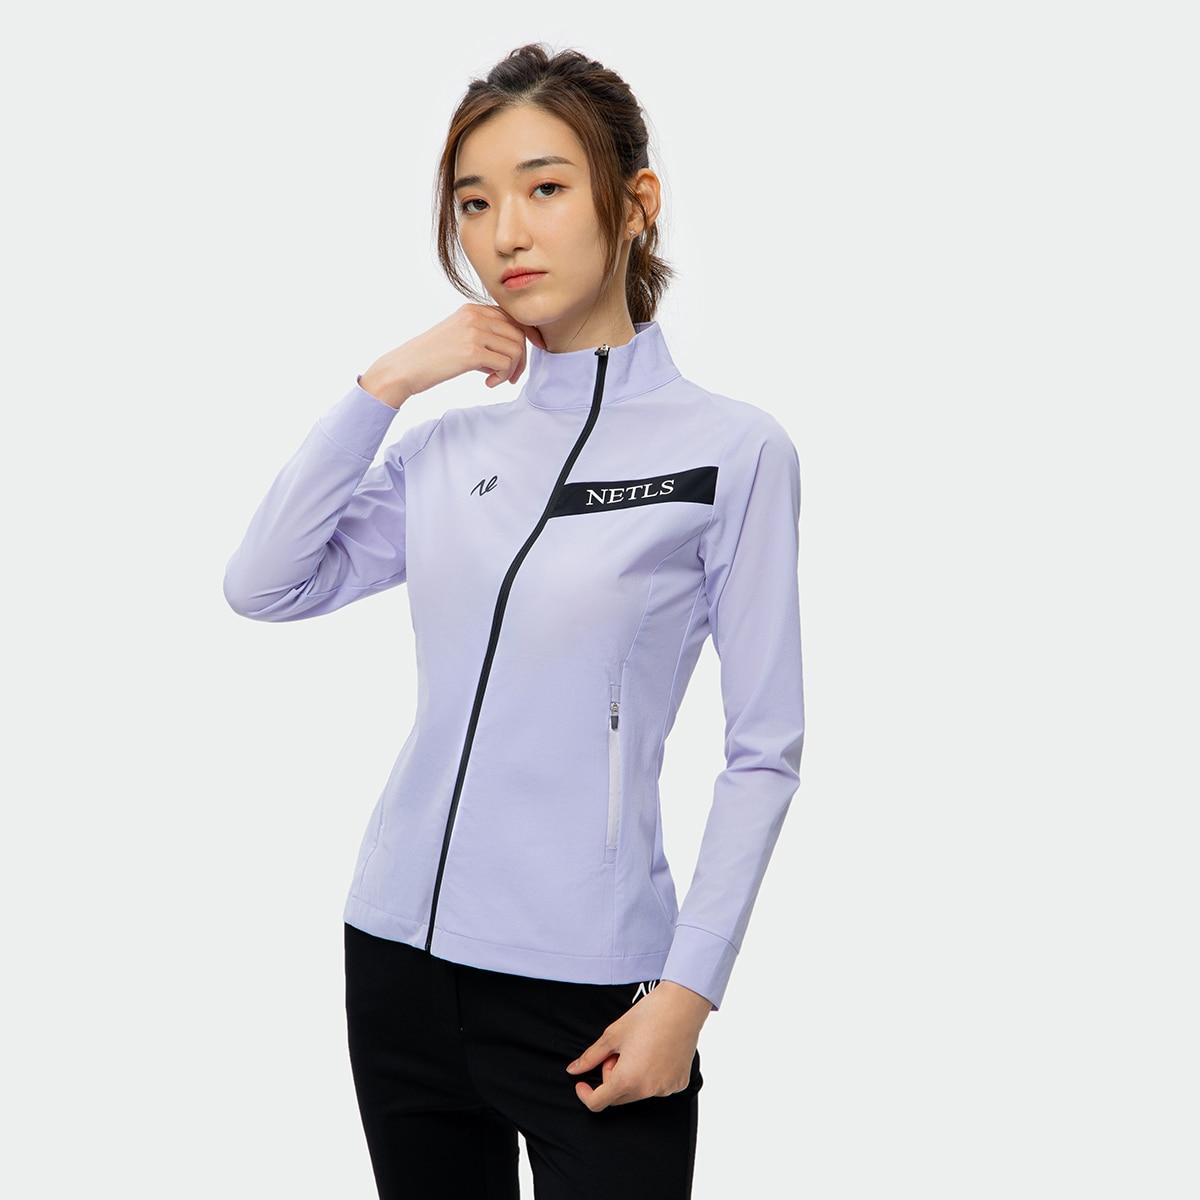 2021  NETLS Golf Autumn Ladies Golf Jacket, Fashionable Style, Diagonal Zipper, Elastic, Ladies Golf Wear